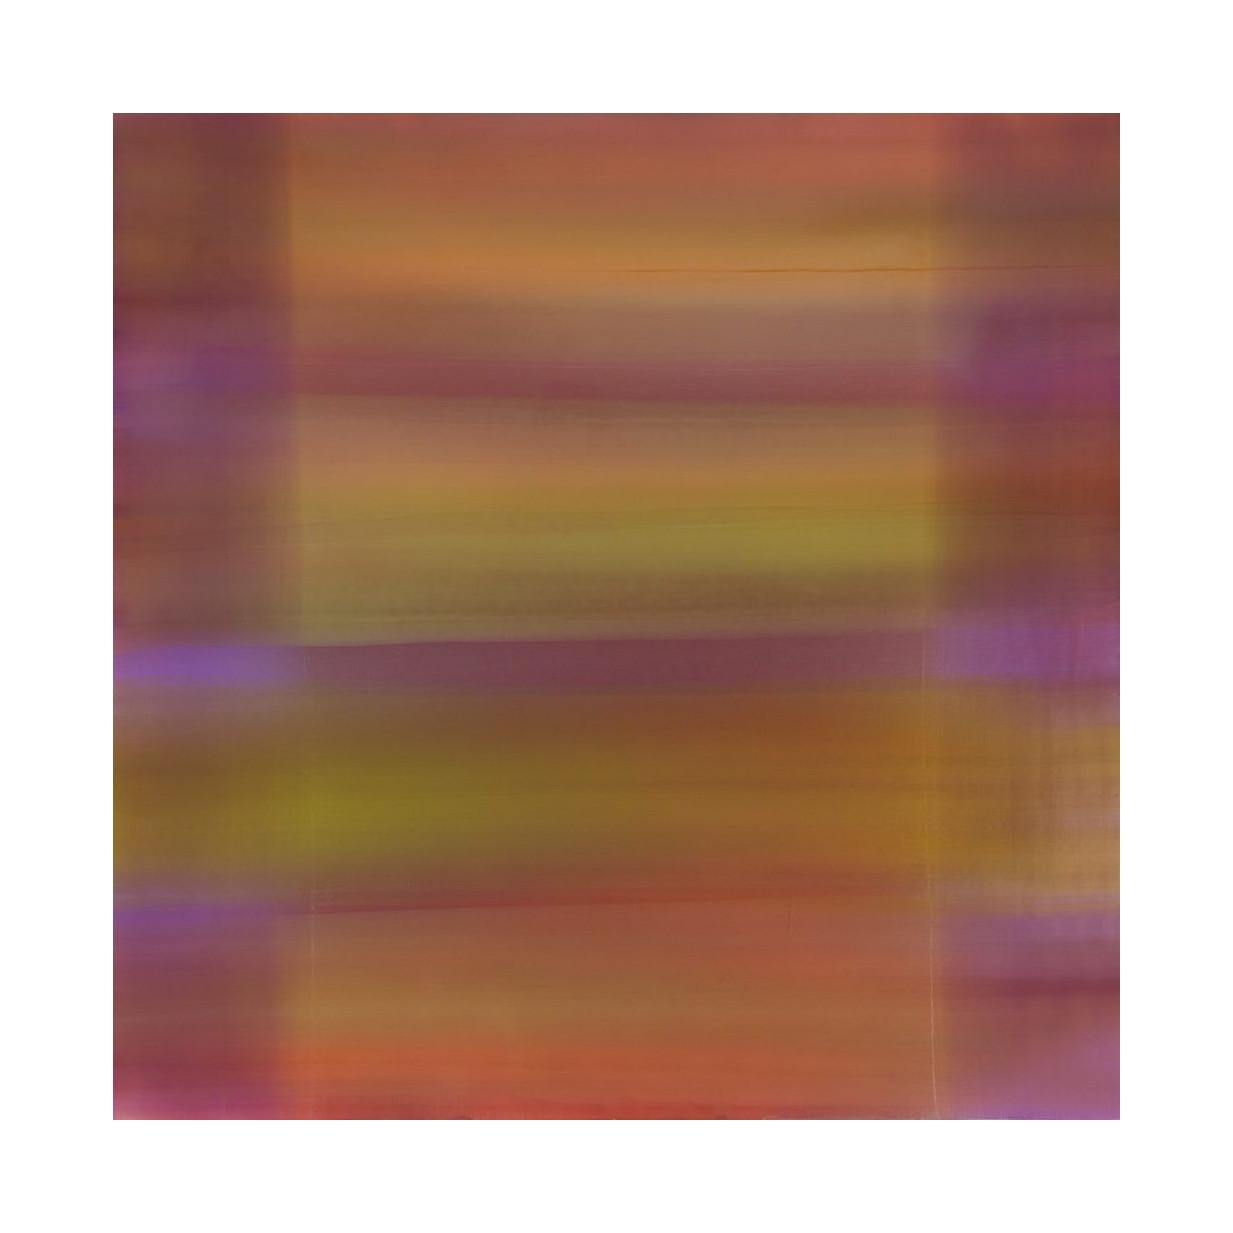 Chimera #27  Acrylic on panel  47x47x2.5 inches  2008